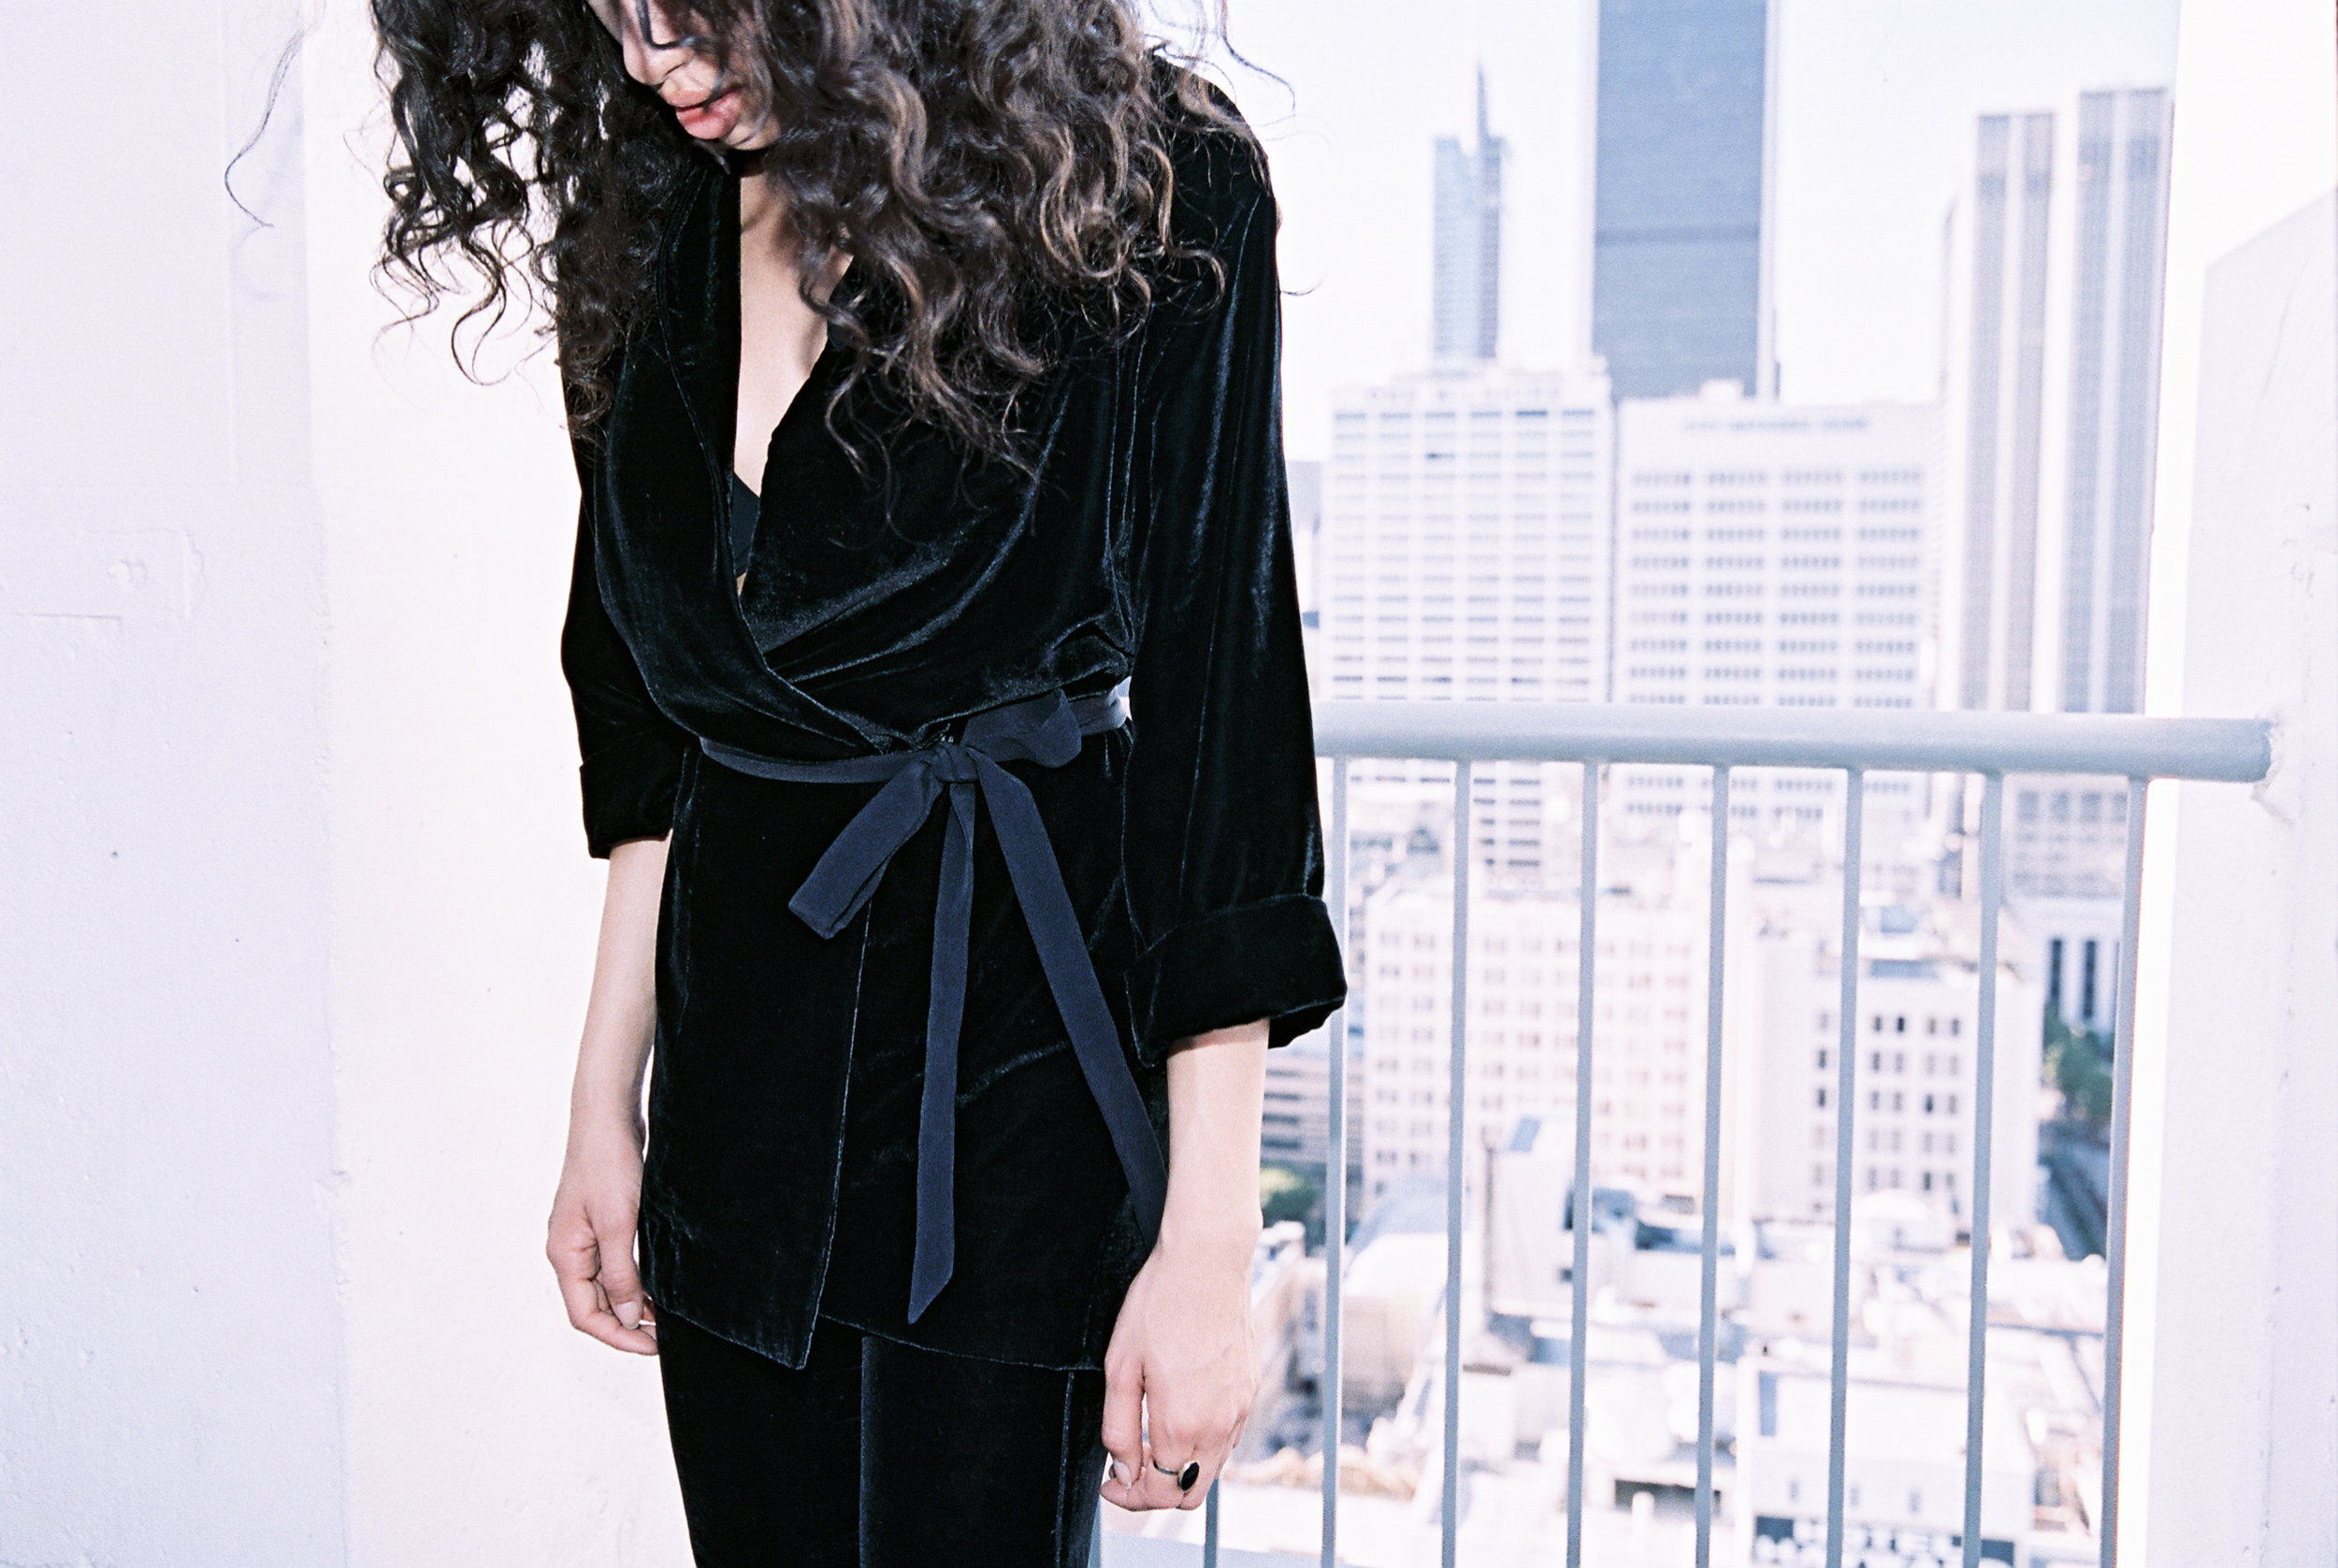 fashion design - 01.